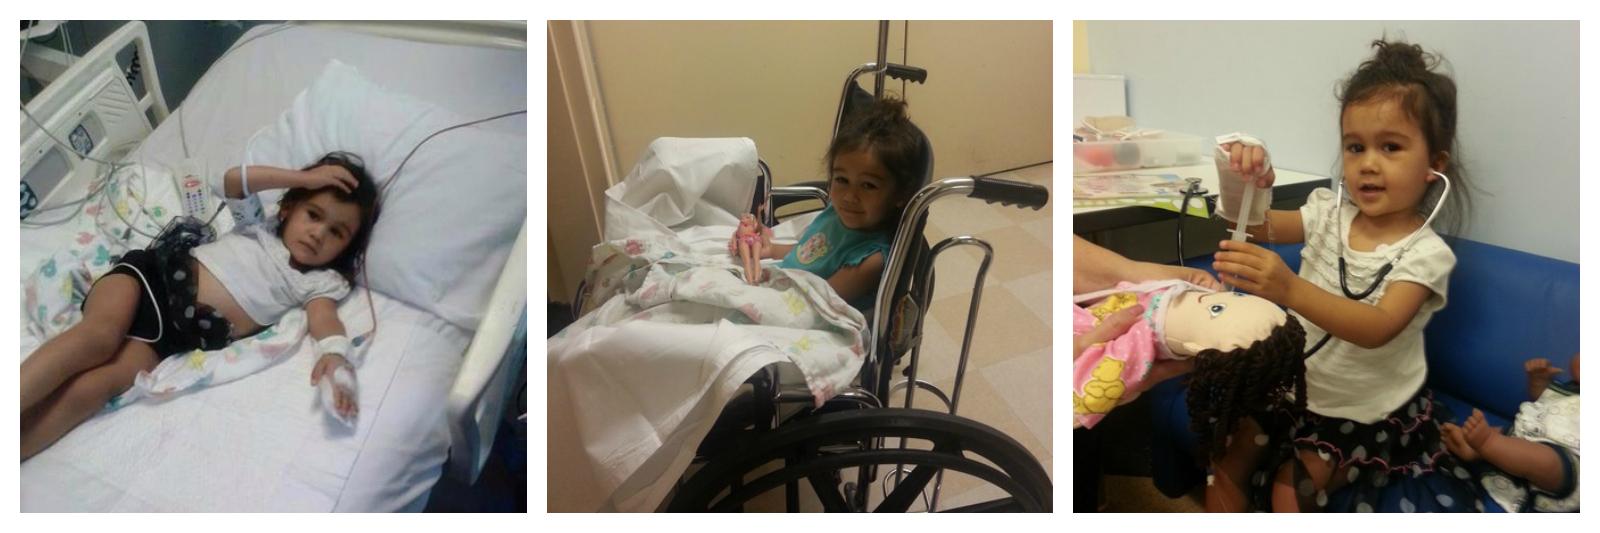 Aubrey while in treatment for acute lymphoblastic leukemia (ALL)